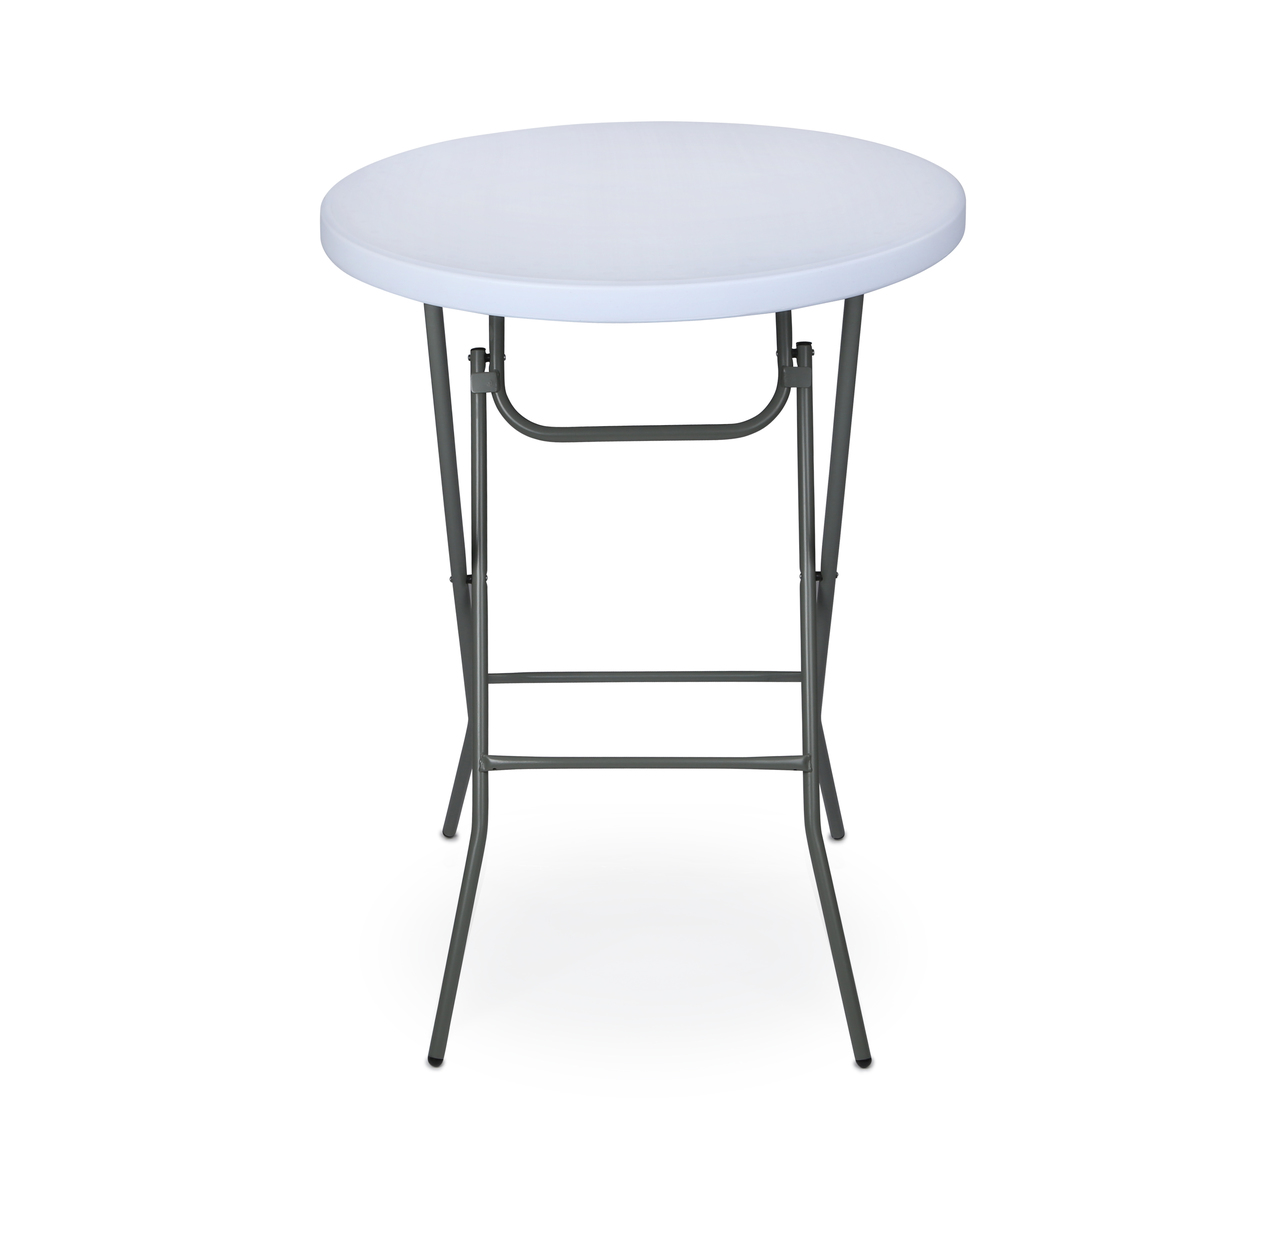 Rhinolite 32 Round Plastic Folding High Top Cocktail Table 43 5 Bar Height Folding Steel Frame With Locking Mechanism Foldingchairsandtables Com